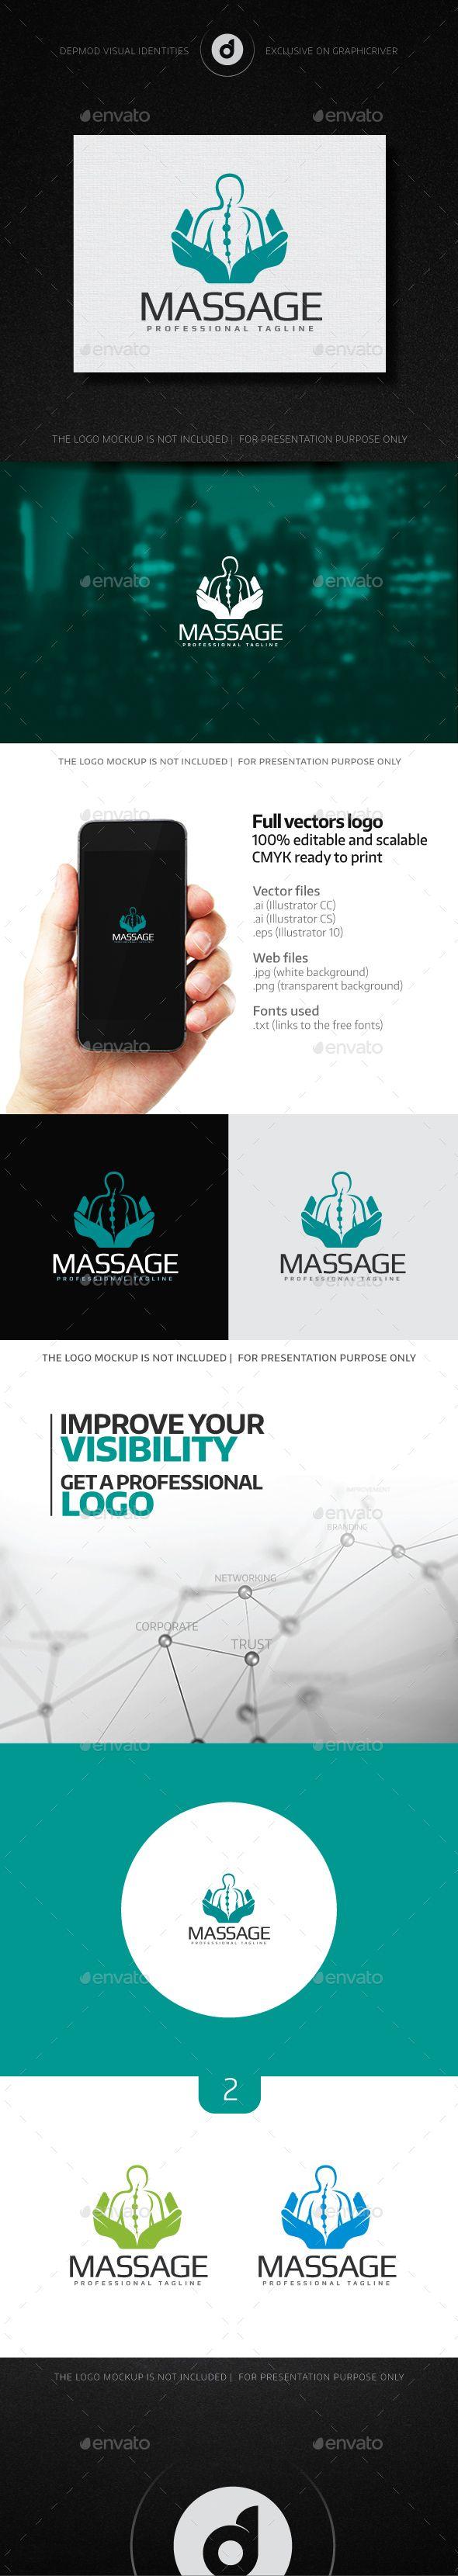 Massage Logo — Transparent PNG #spa #massage • Available here → graphicriv...